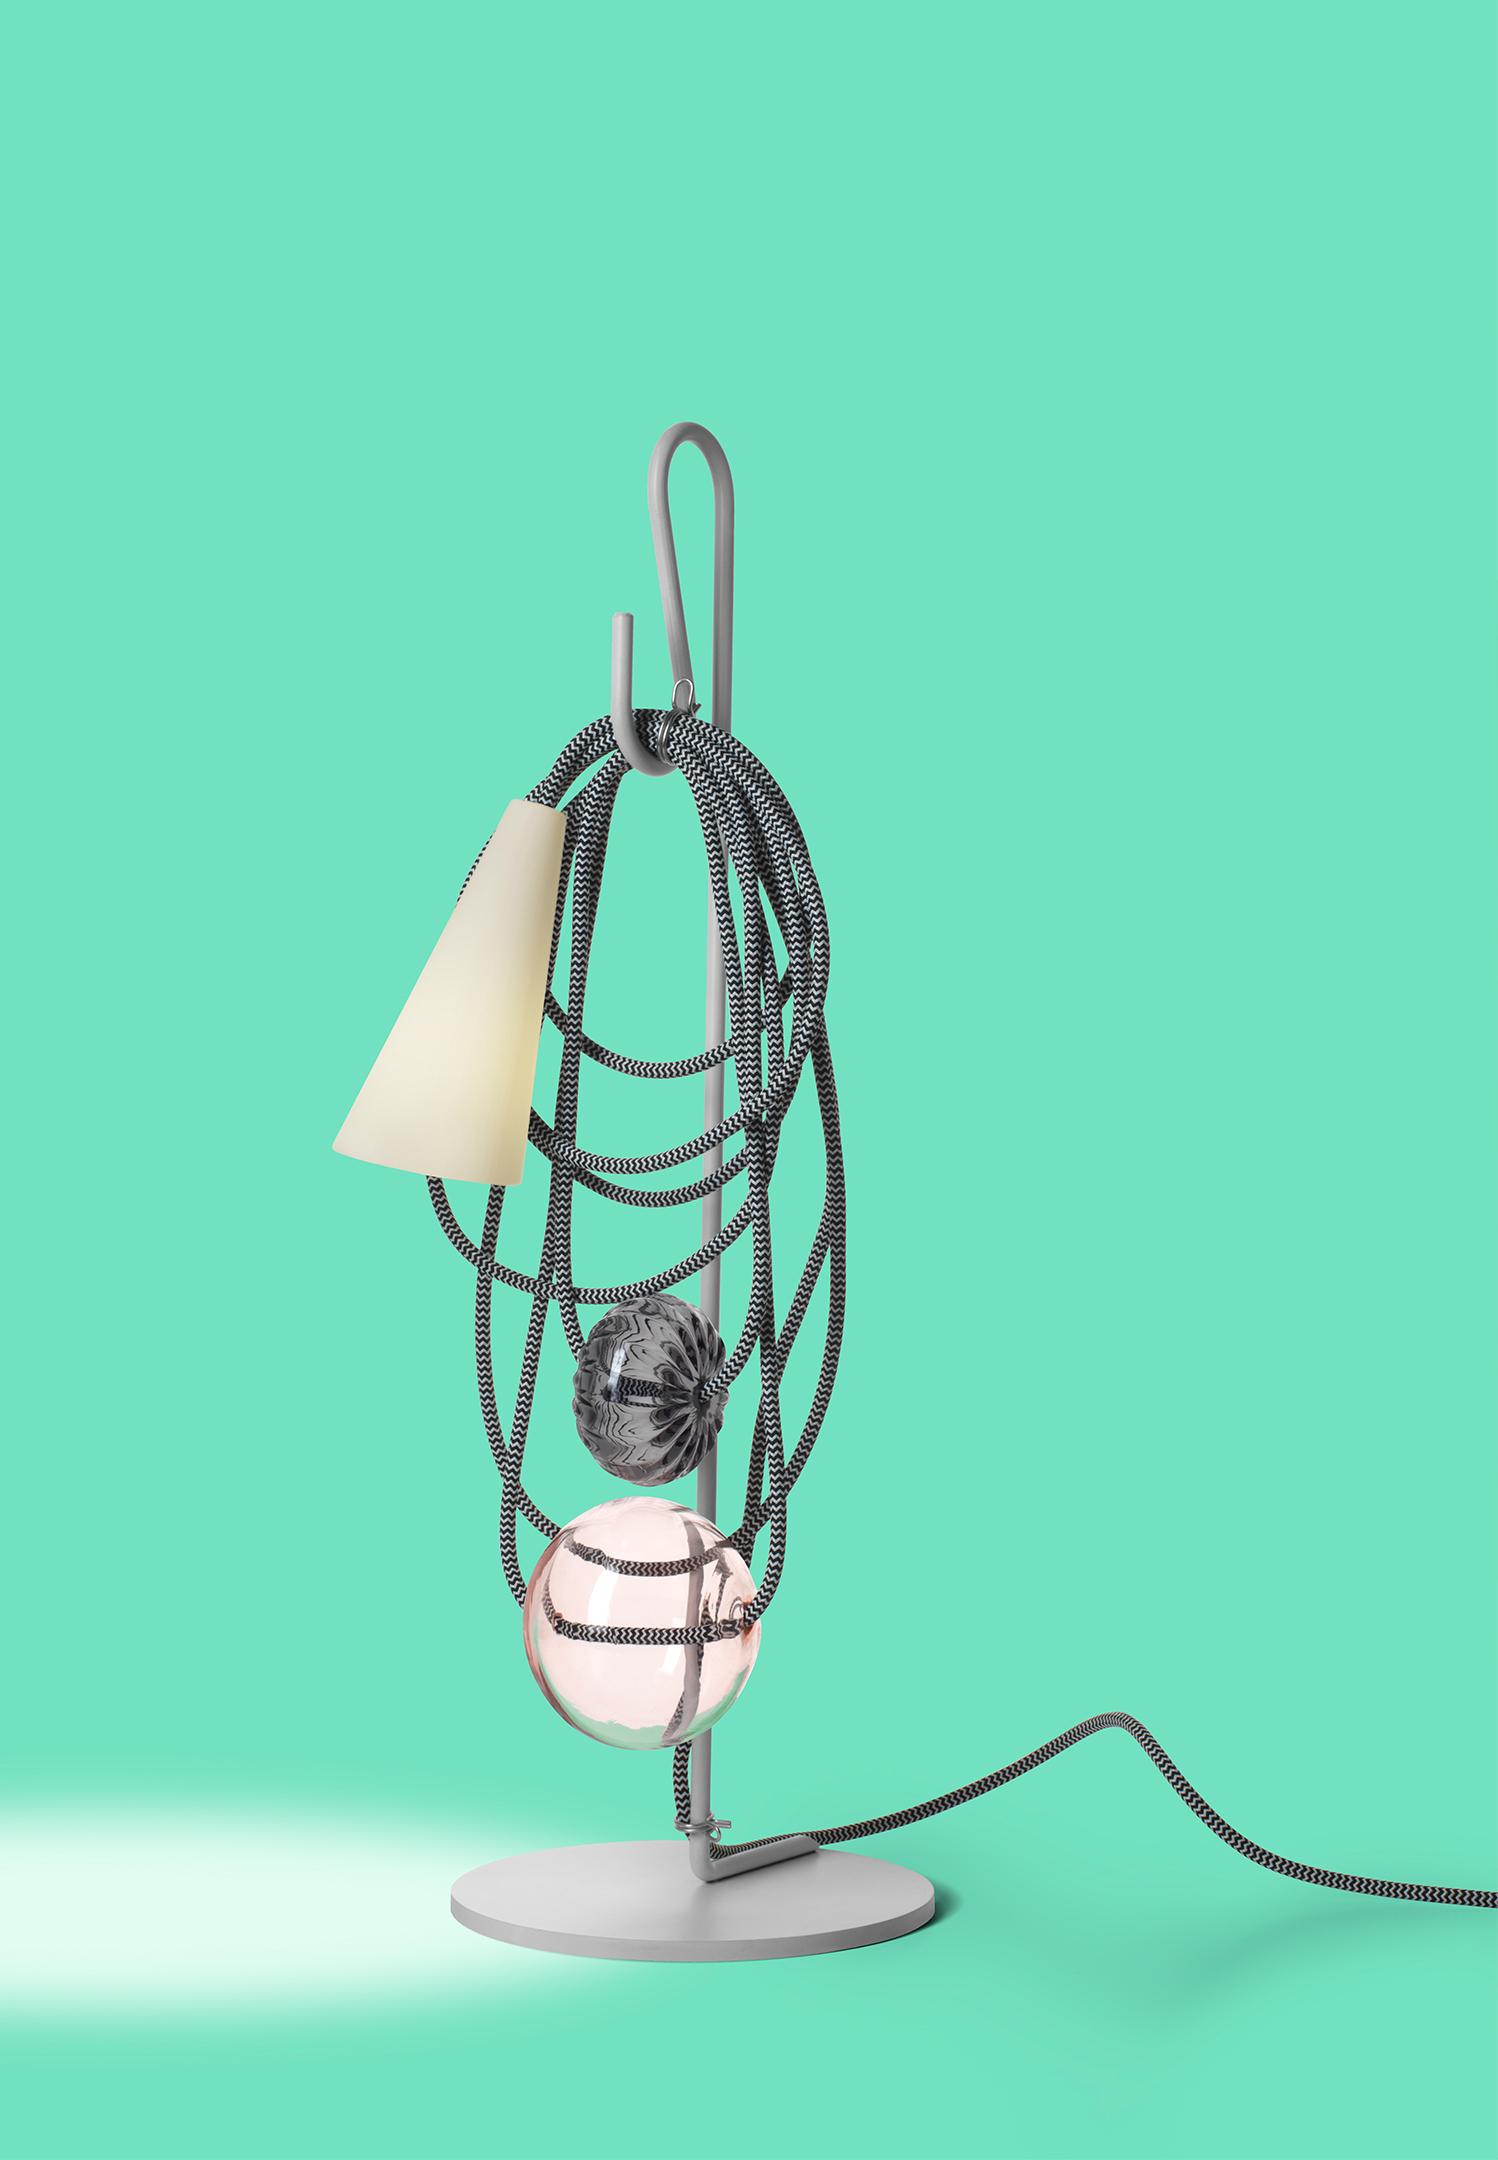 Foscarini launched the Filo table lamp.